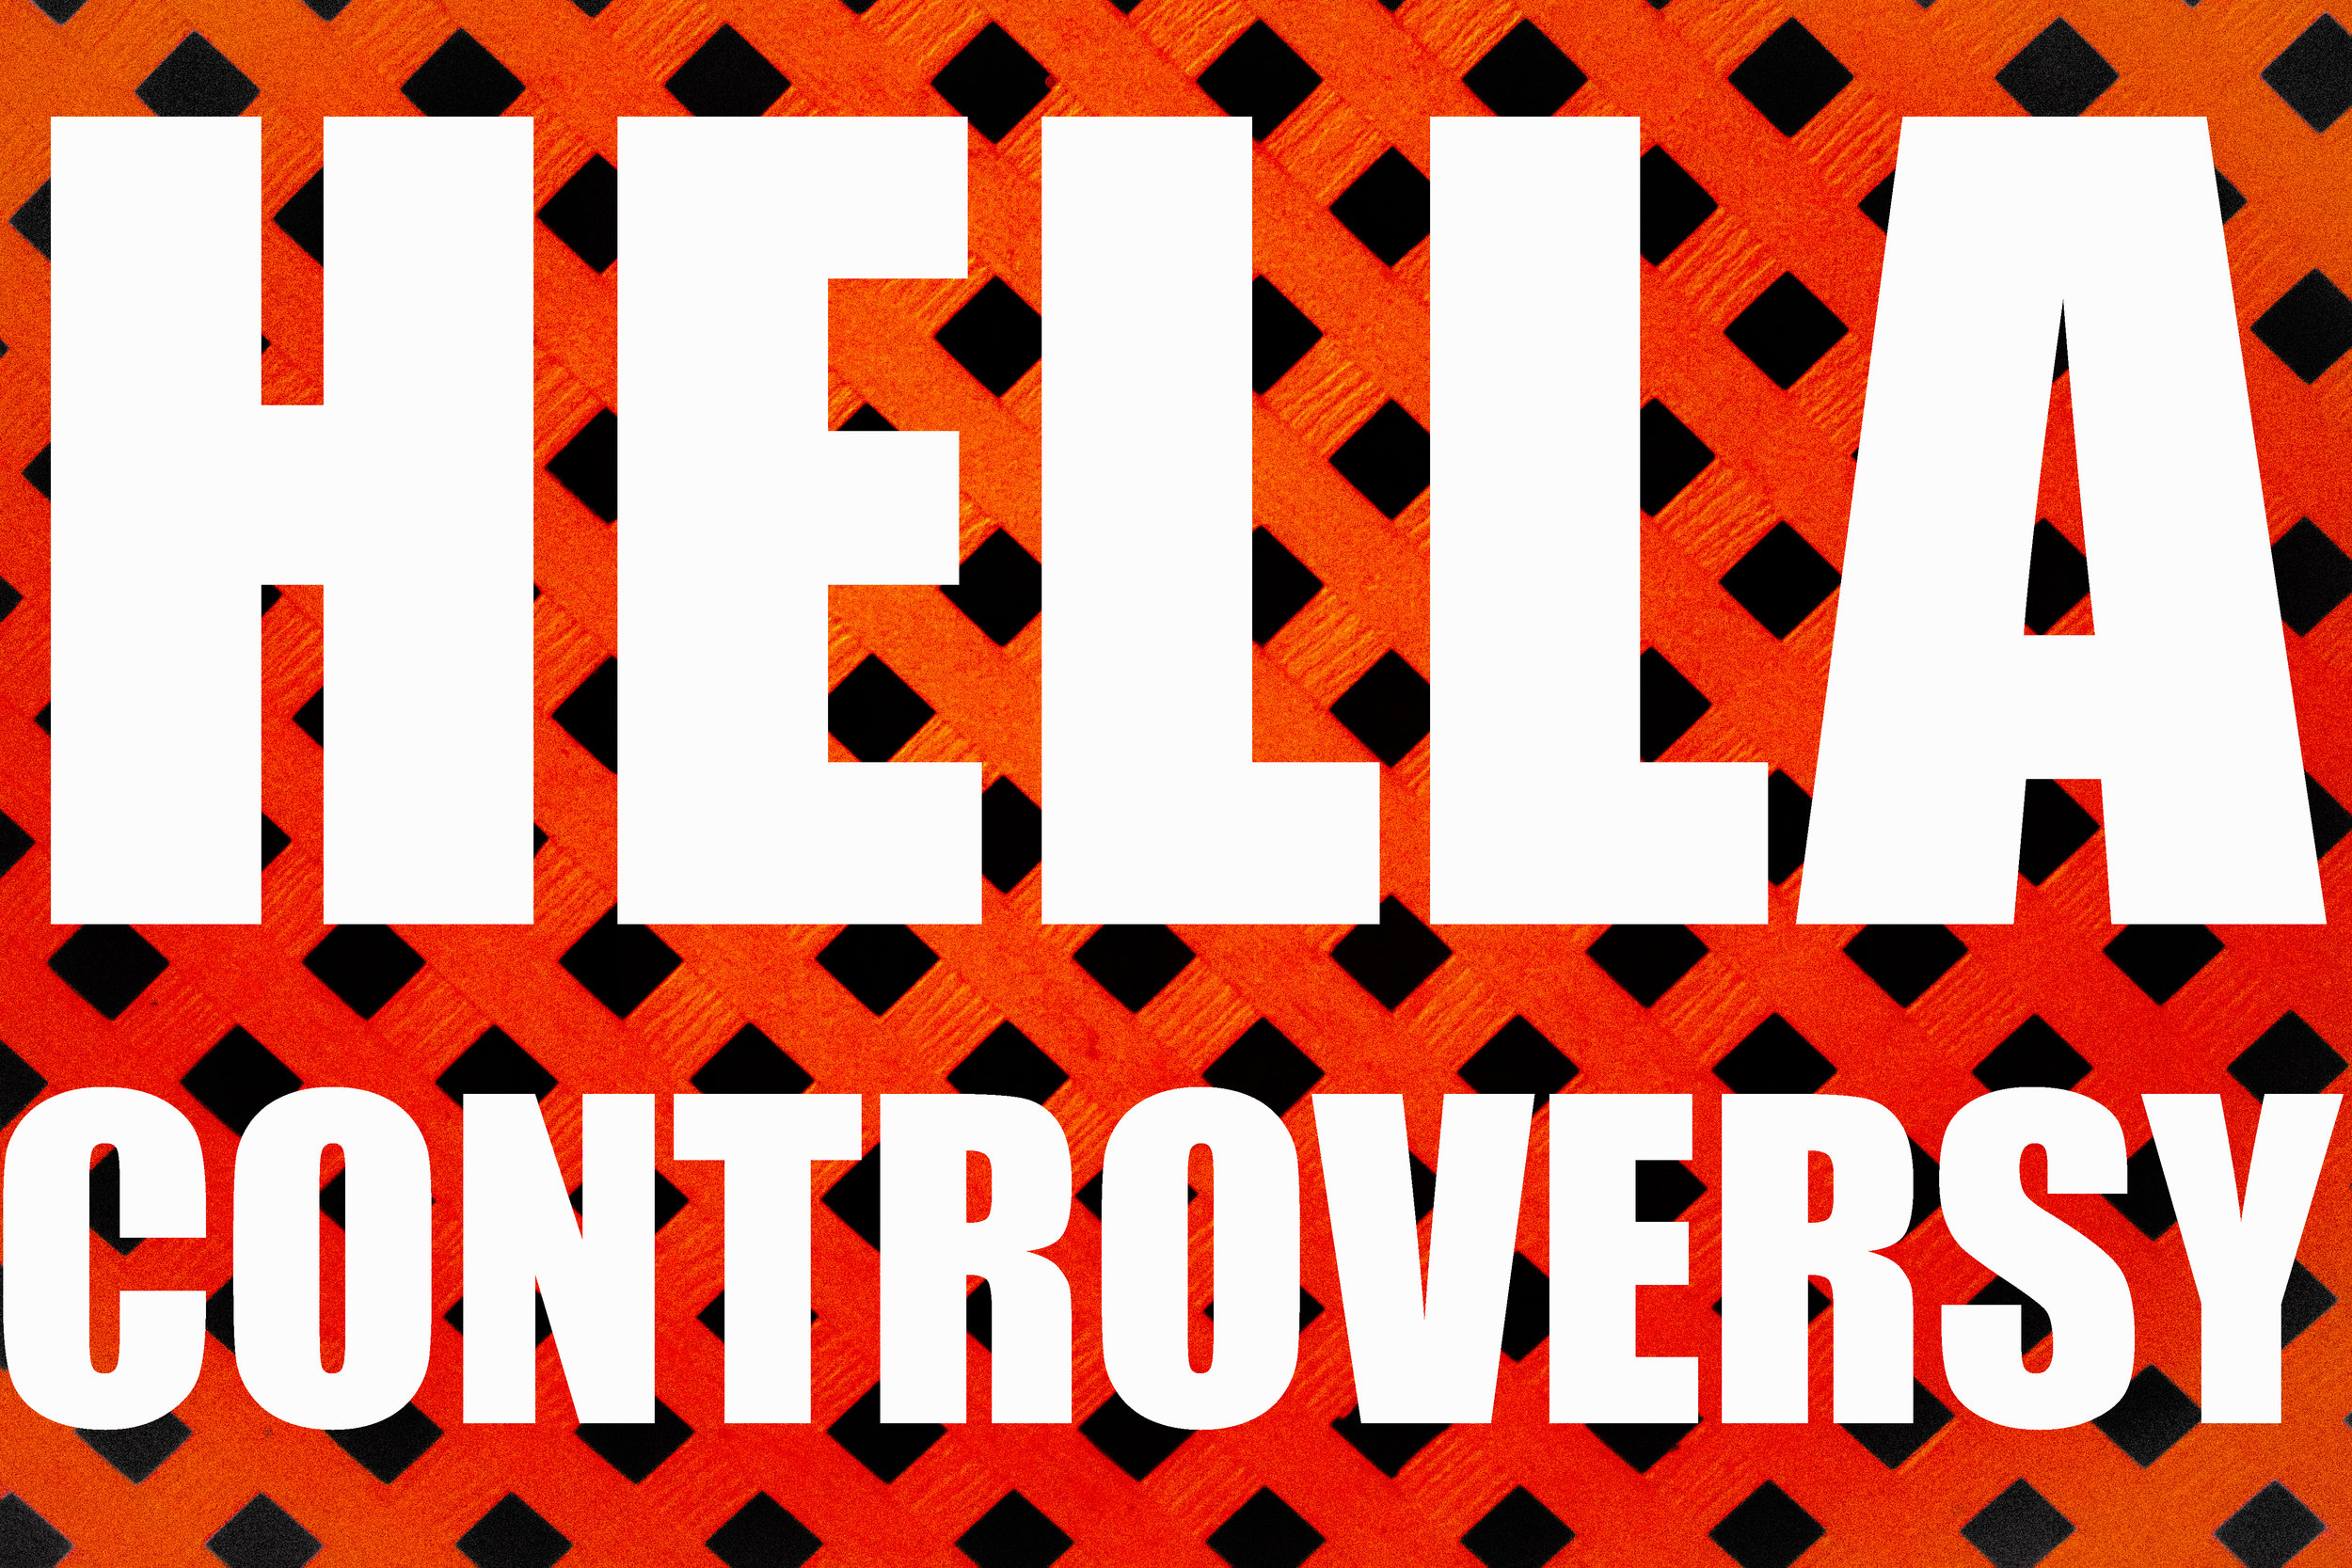 Hellacontroversy3.jpg